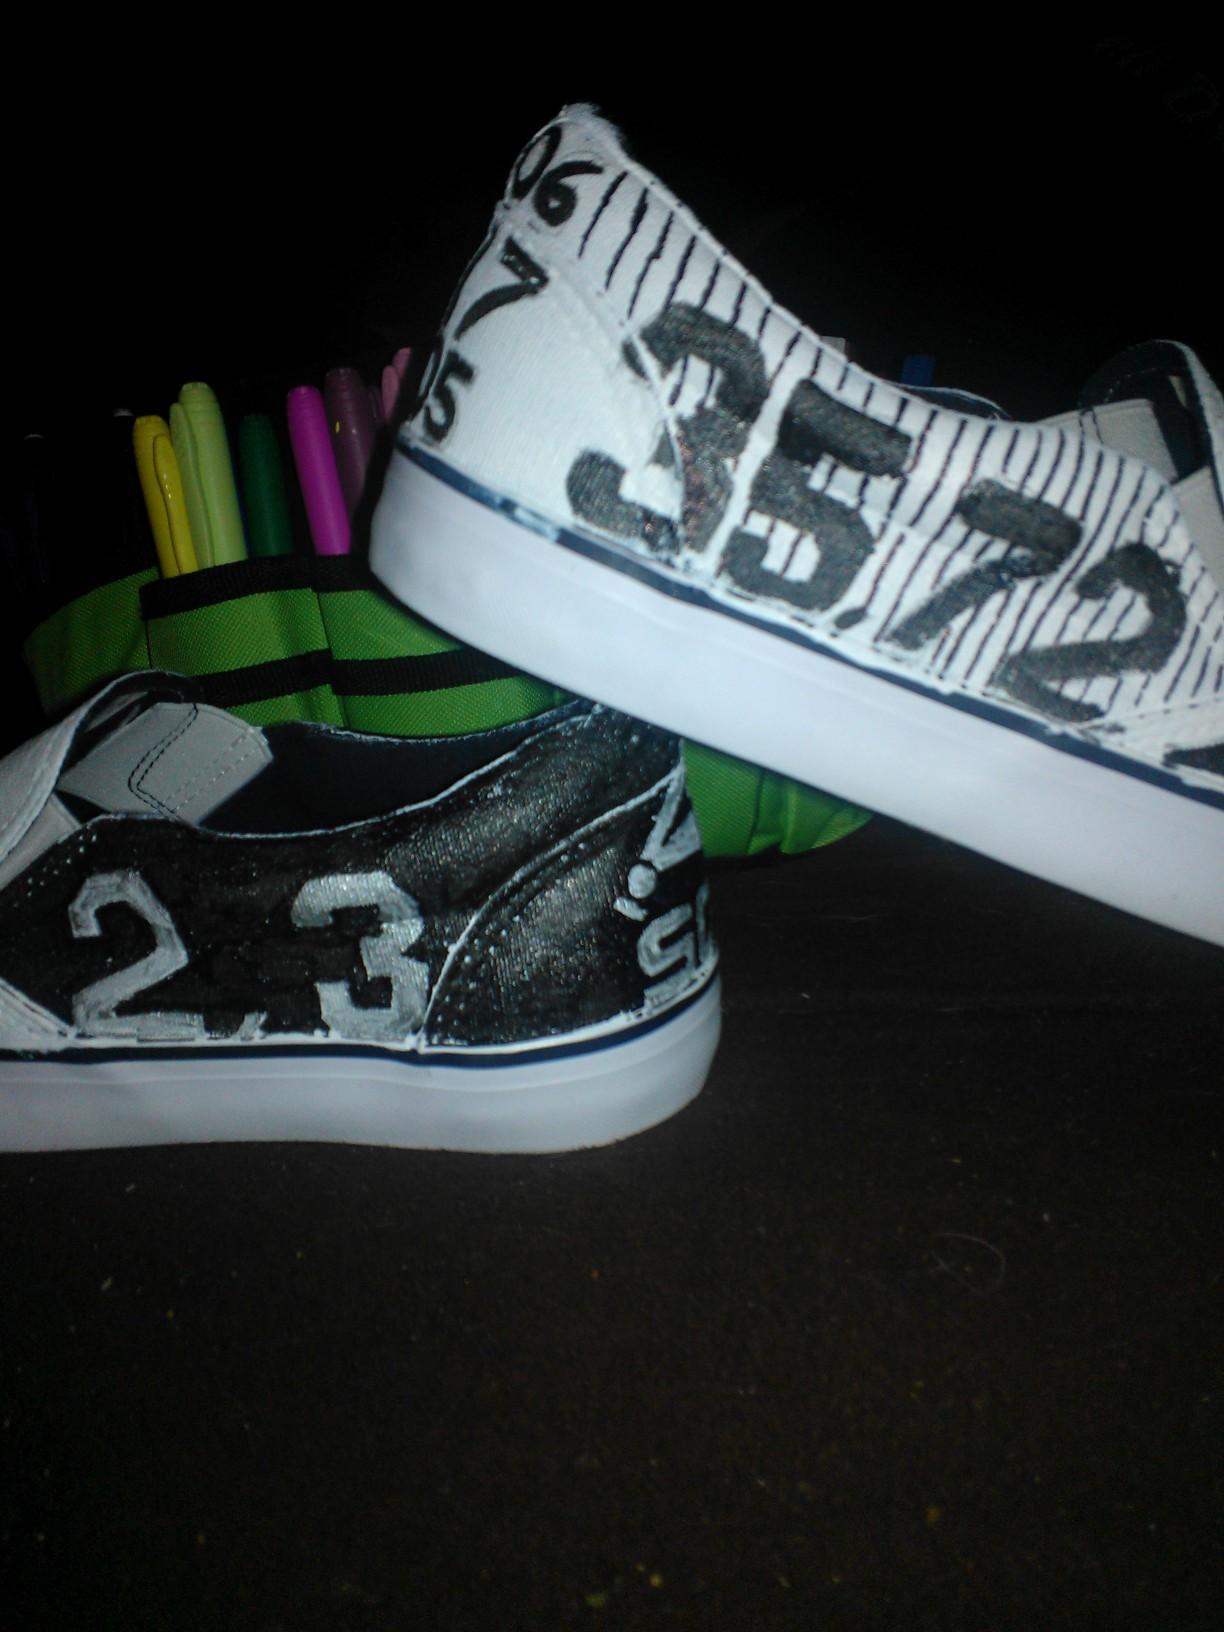 chicago white sox painted shoes 183 amandpmgoods